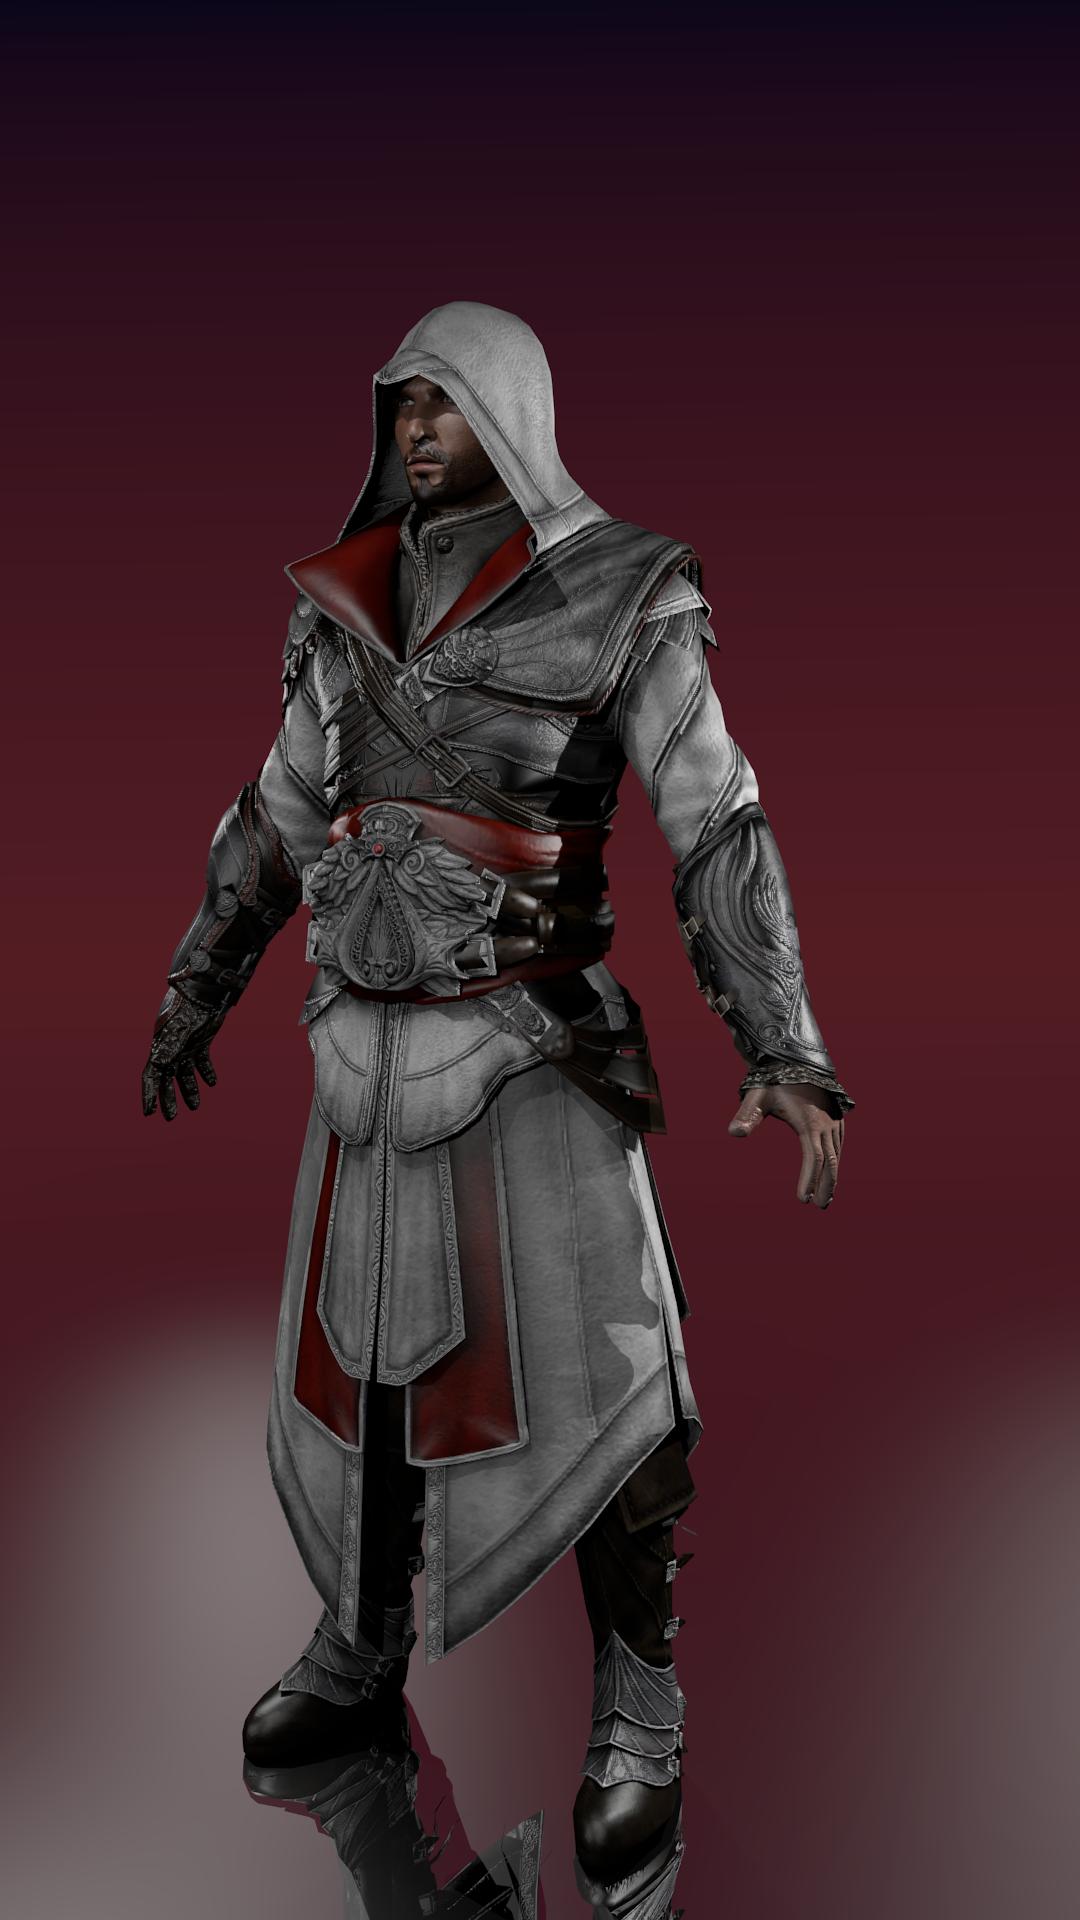 How to Train Like Ezio Auditore Da Firenze advise